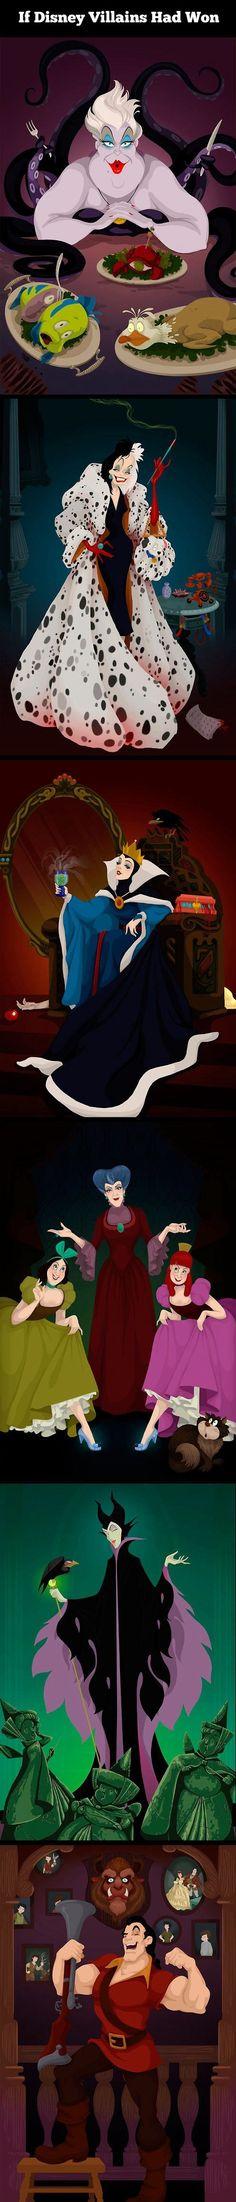 Awesome! Disney Villains